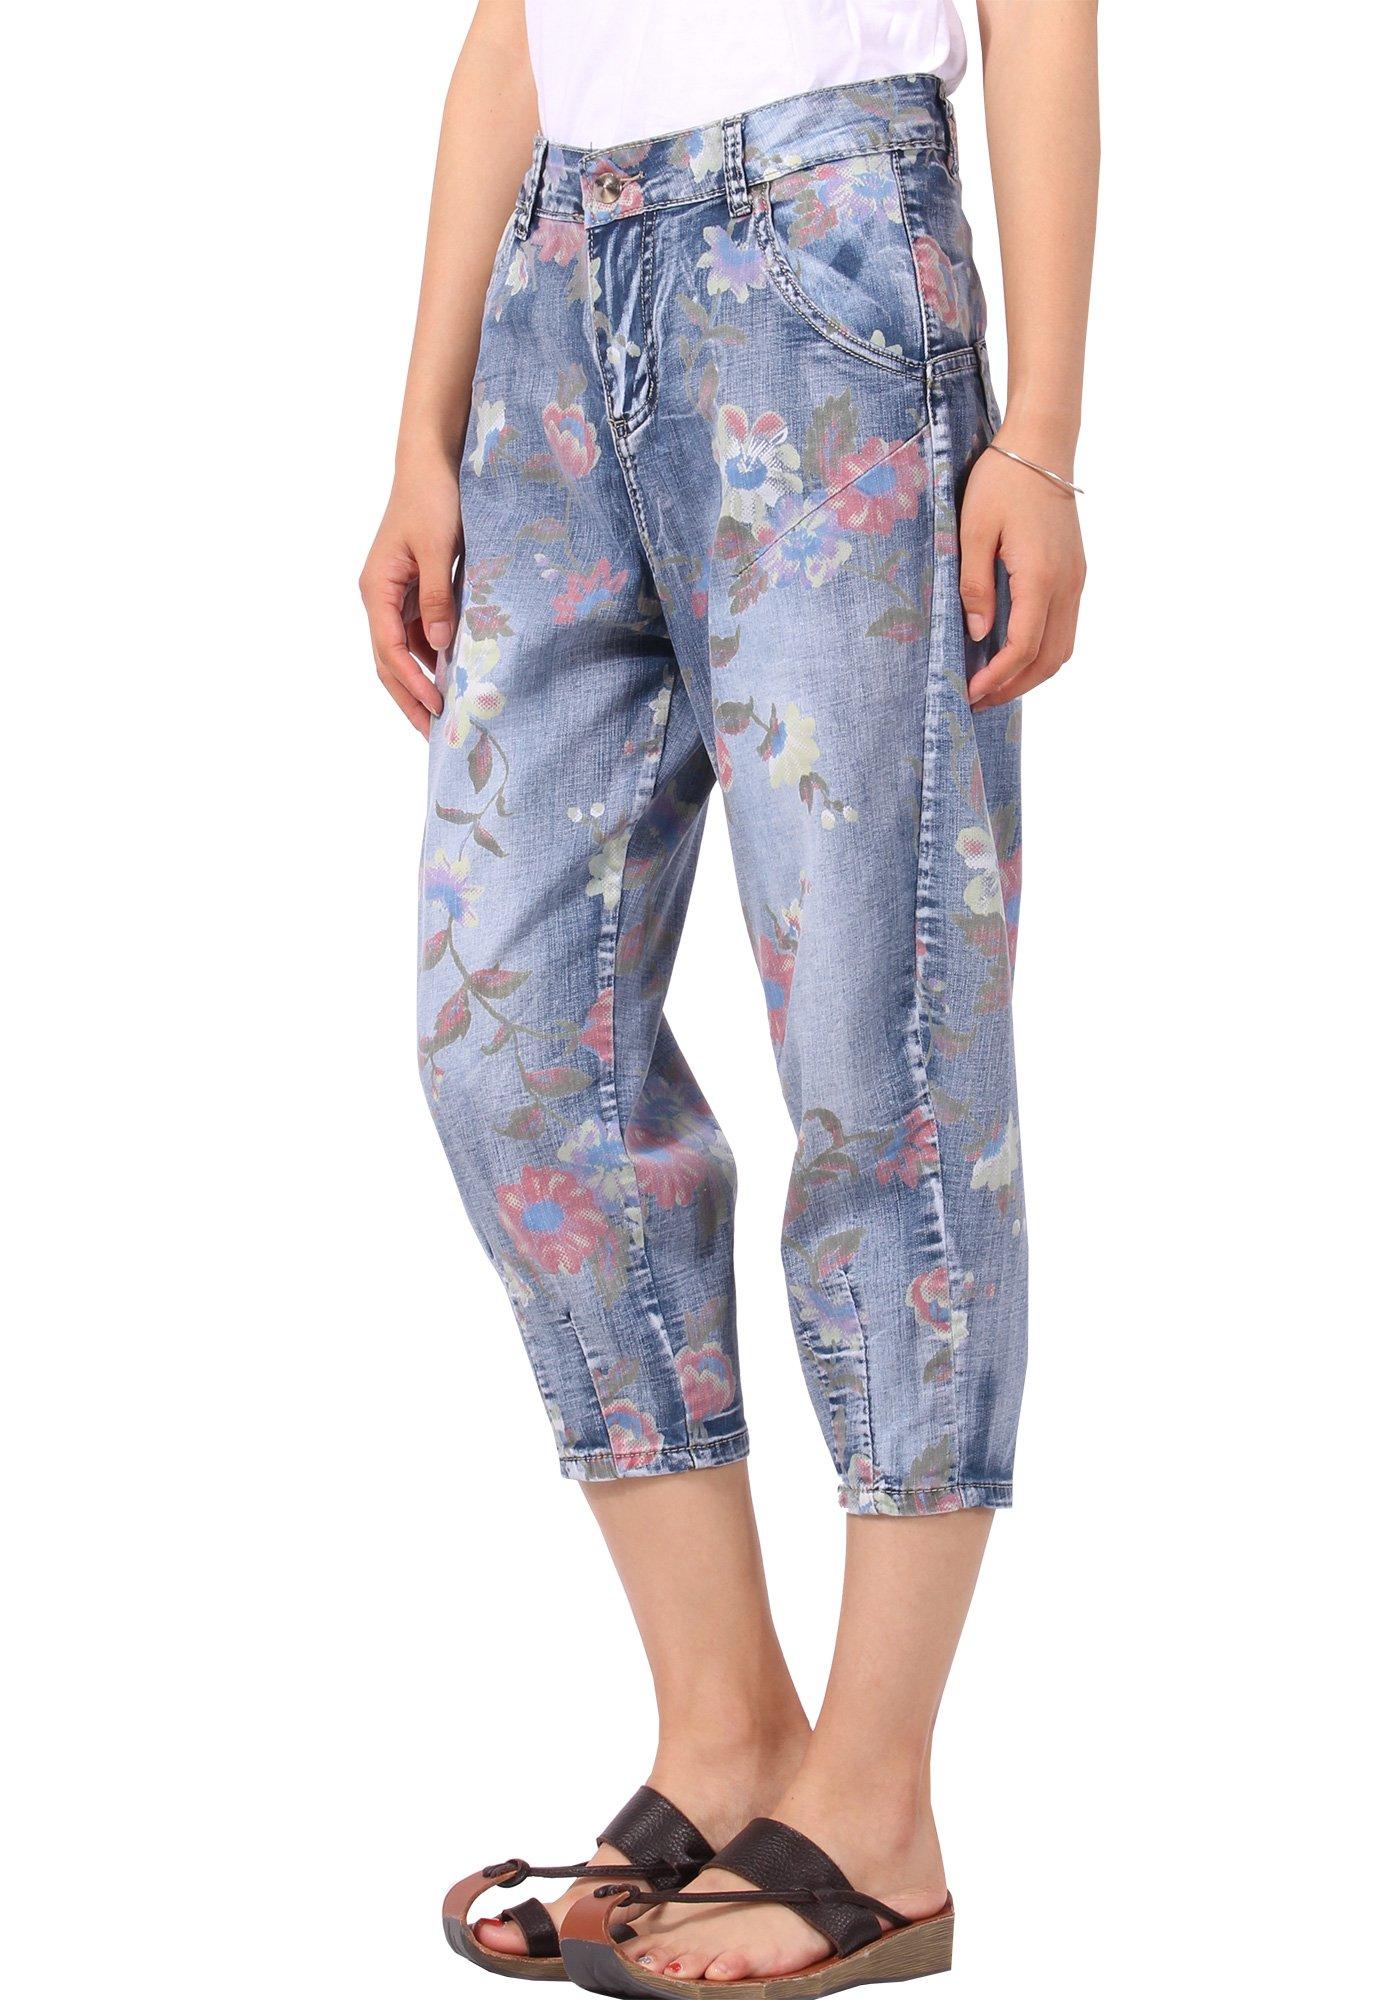 JeansForest Women Summer Printed Cropped Capri Denim Jeans Harem Pants